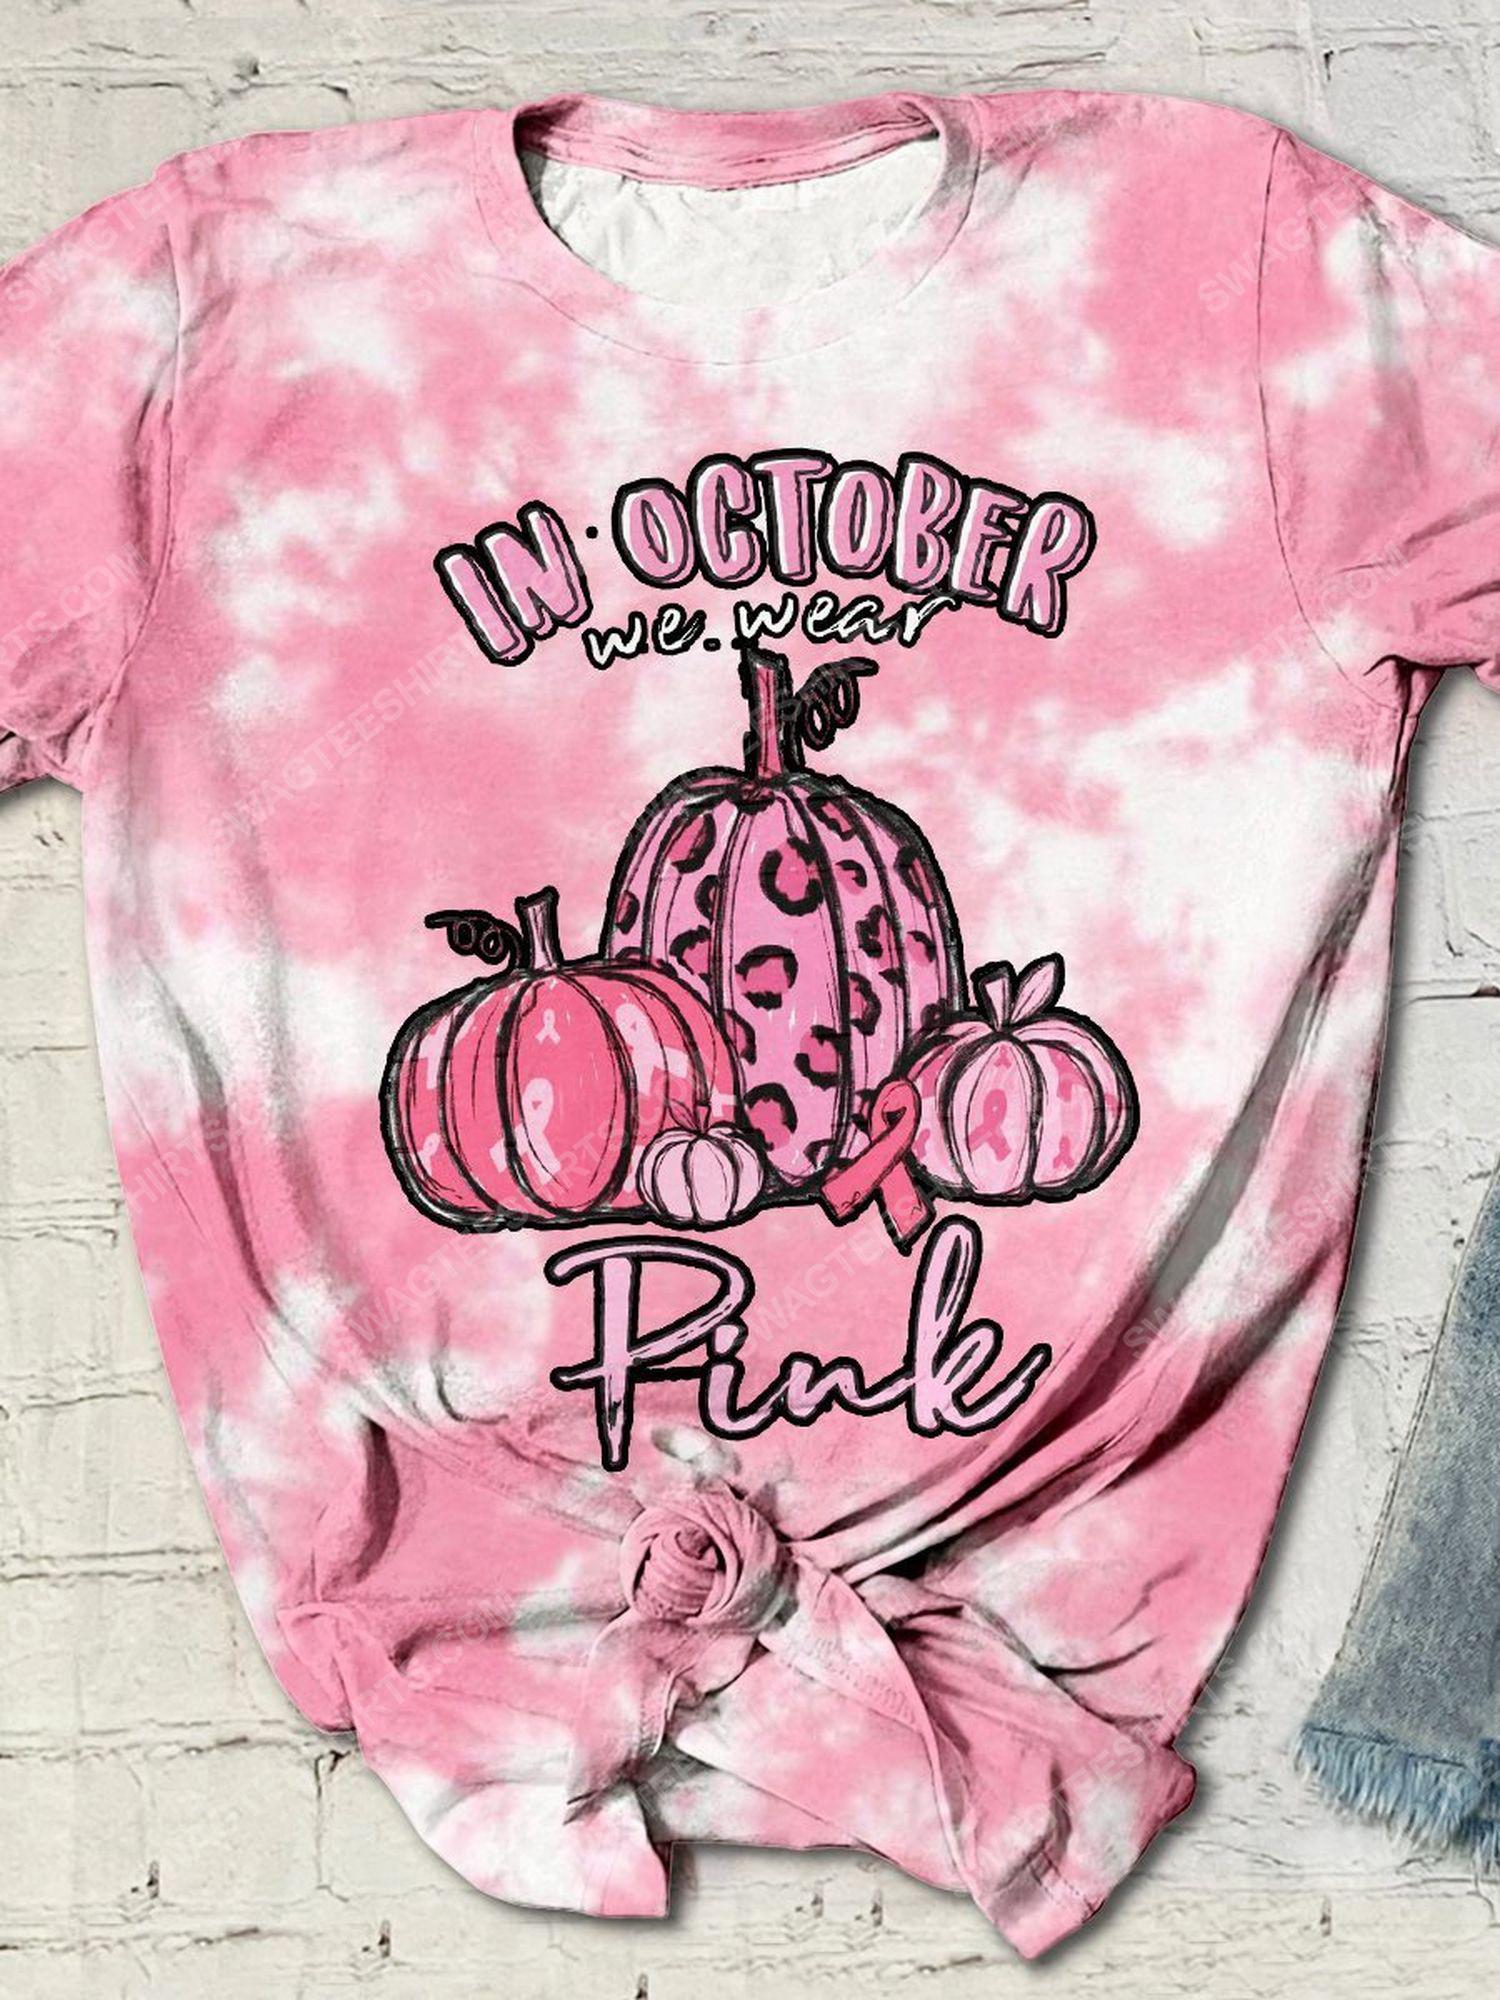 Breast cancer awareness in october we wear pink pumpkin tie dye shirt